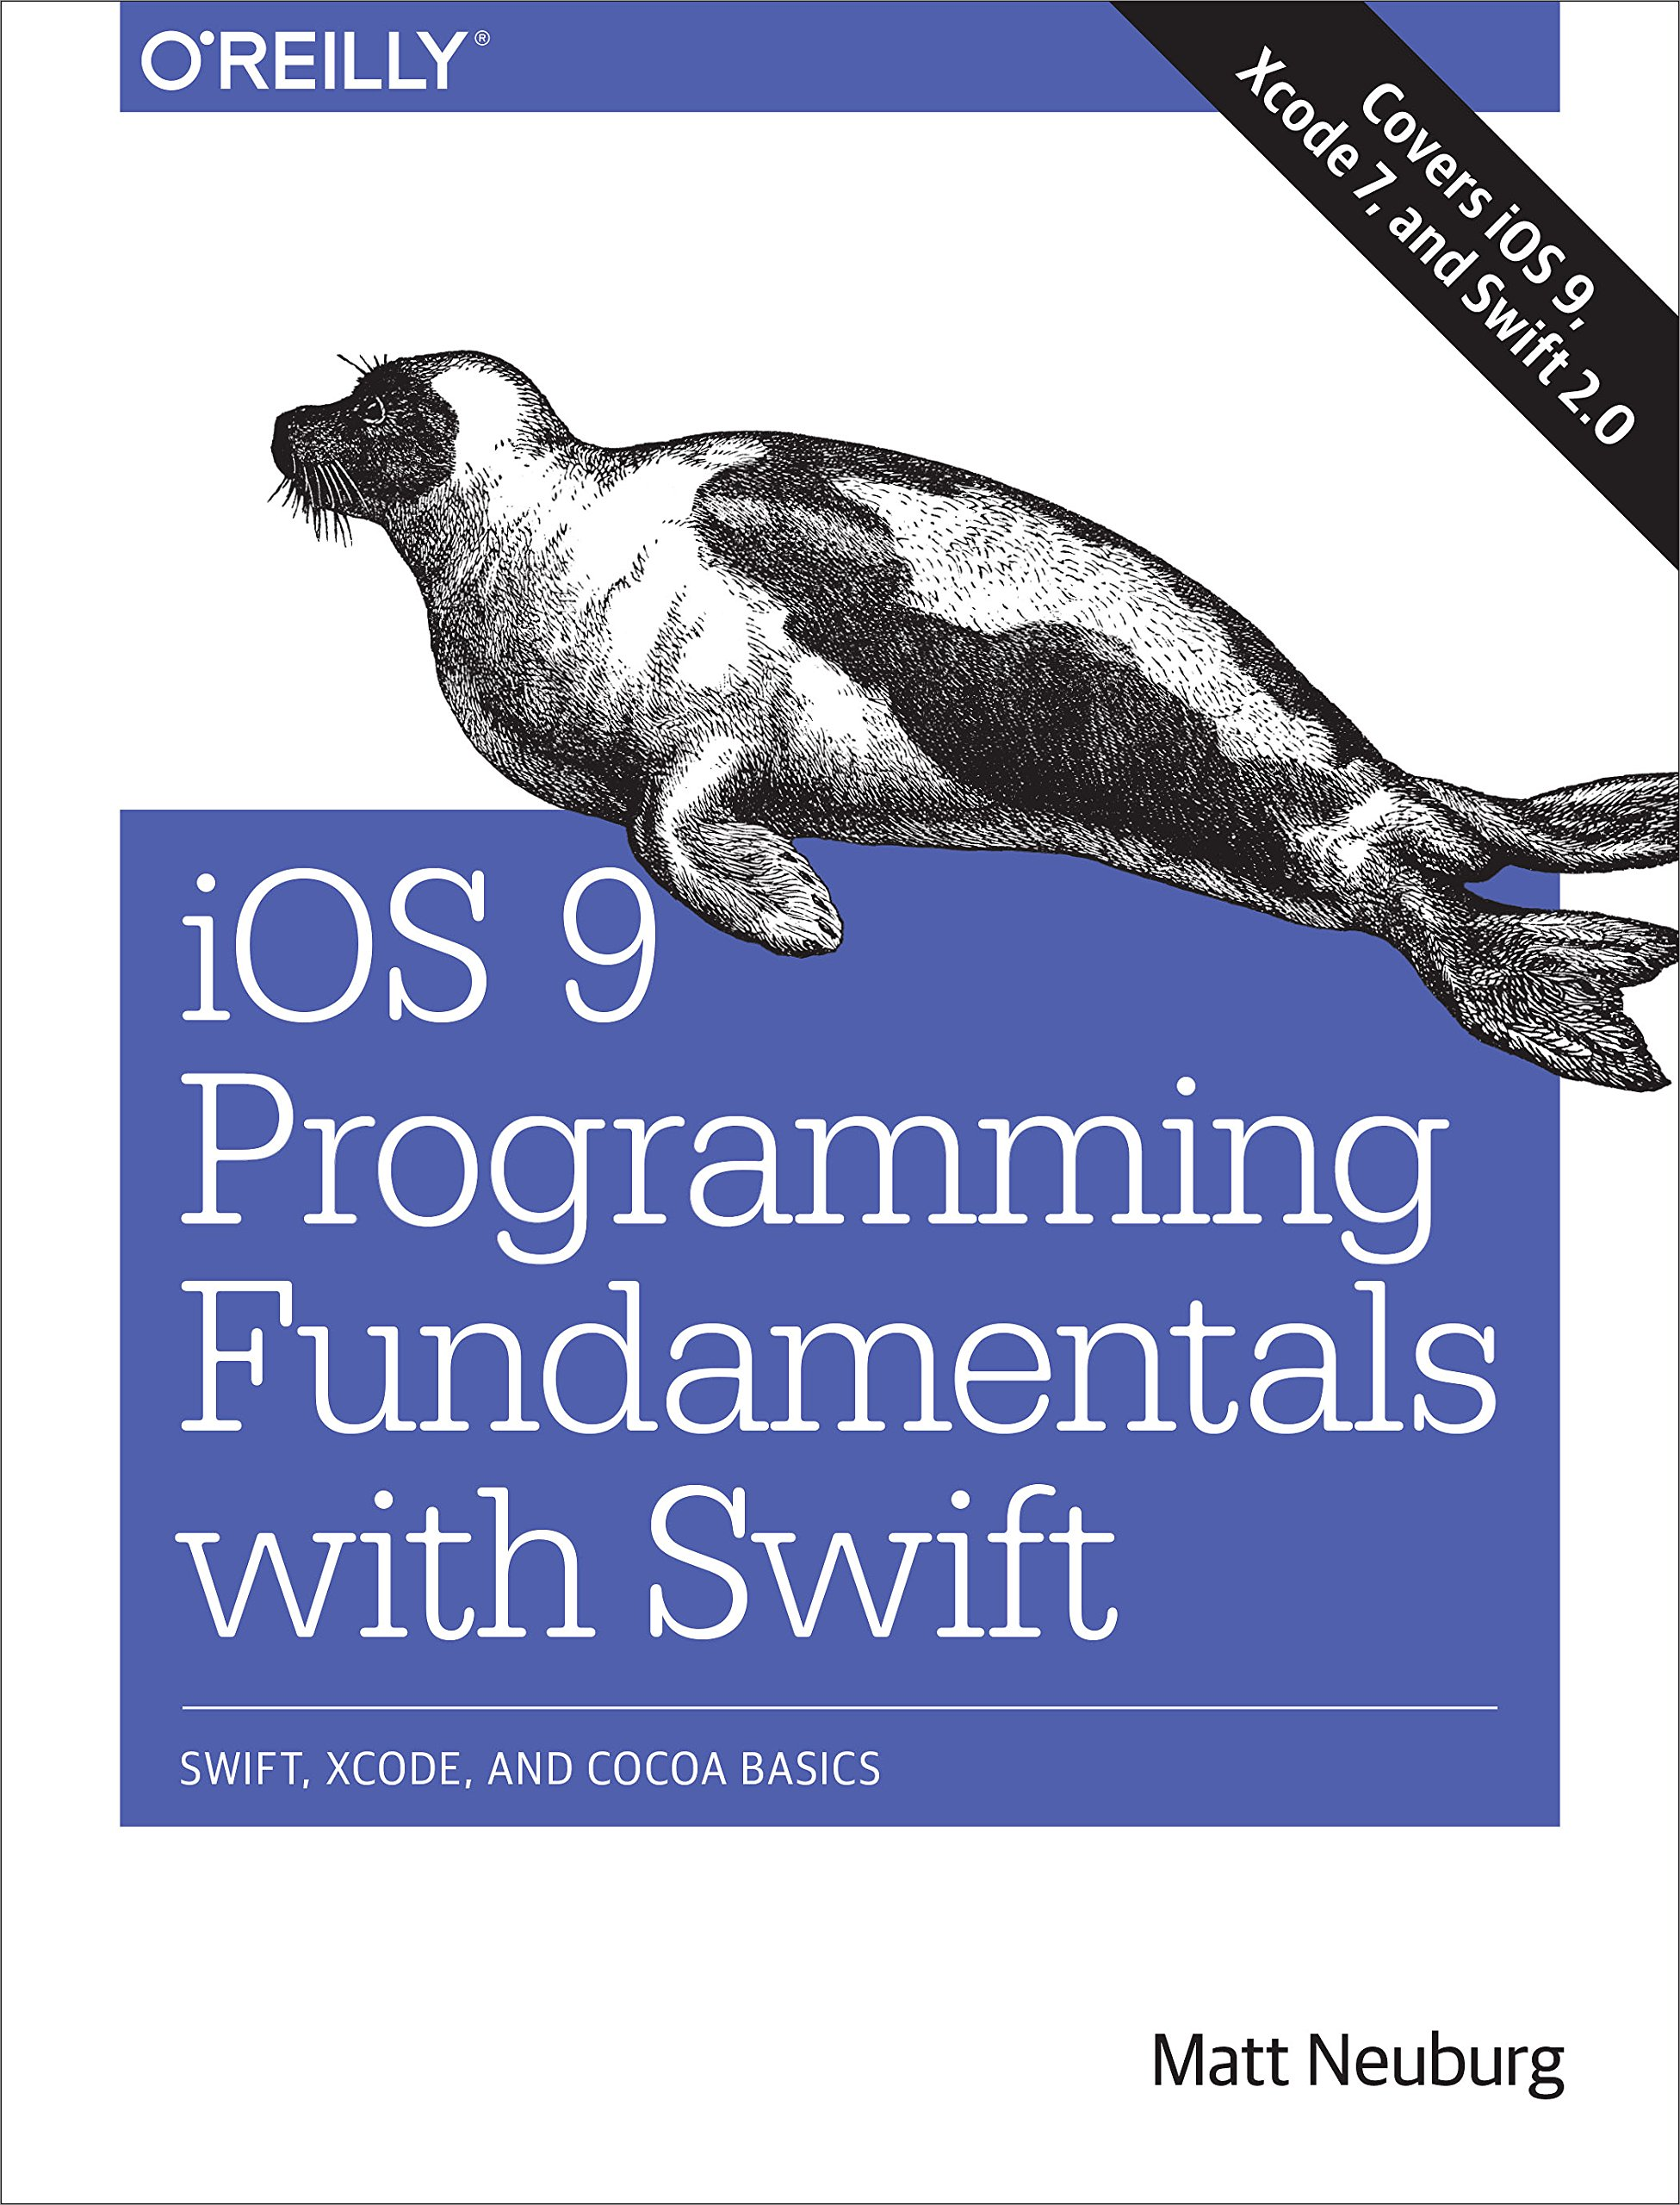 Ios 9 Programming Fundamentals With Swift: Swift, Xcode, And Cocoa Basics:  Amazon: Matt Neuburg: 9781491936771: Books